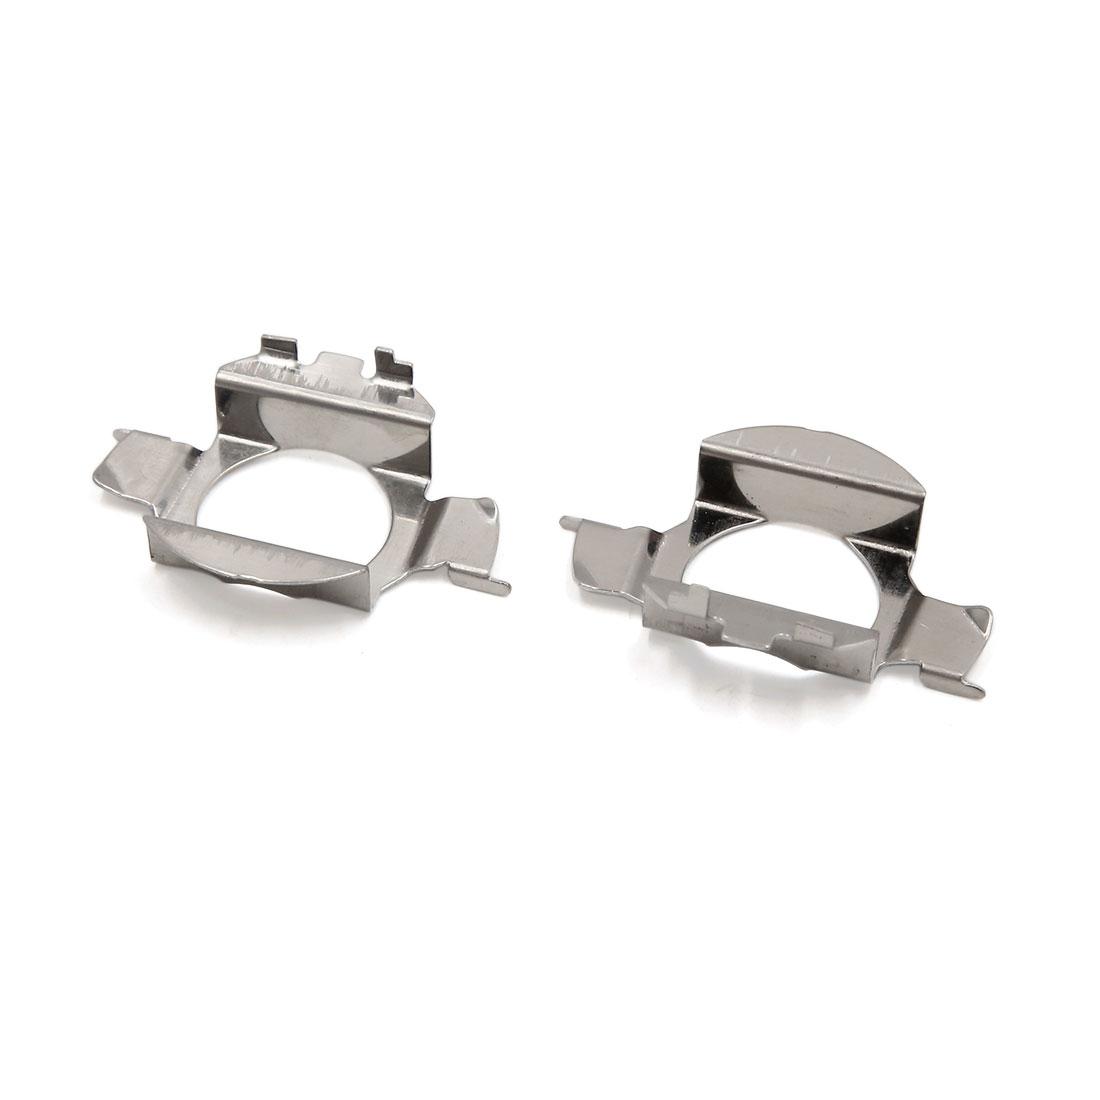 2Pcs Silver Tone Metal LED Xenon Headlight Bulb Holder Adapter Base for New Bora